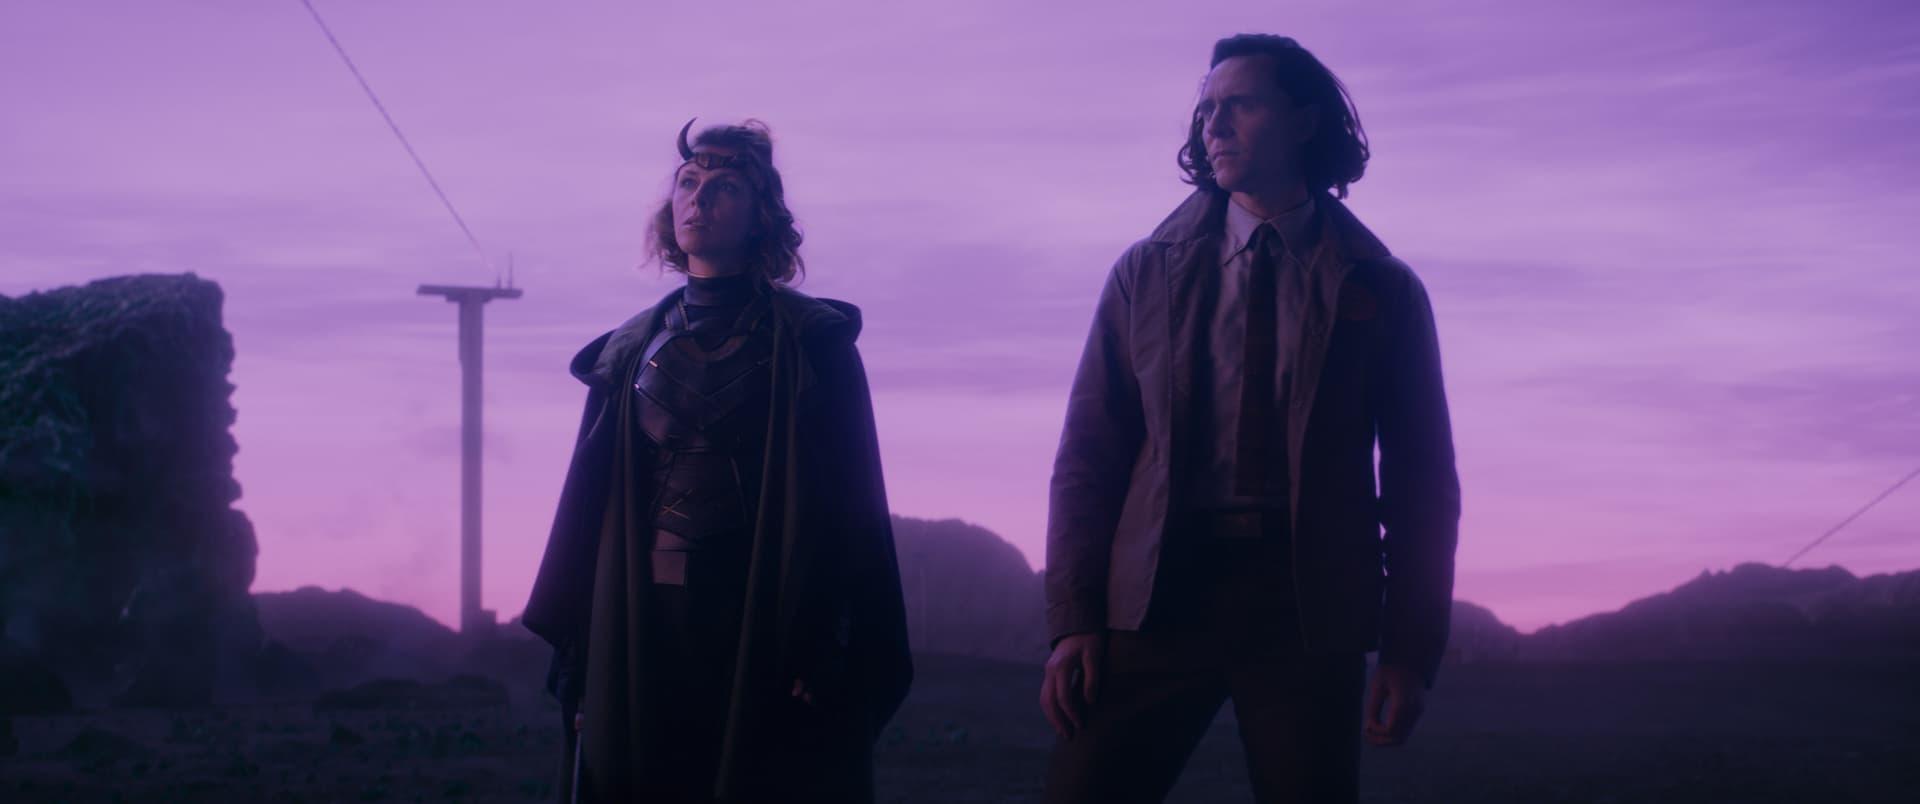 Loki and Sylvie